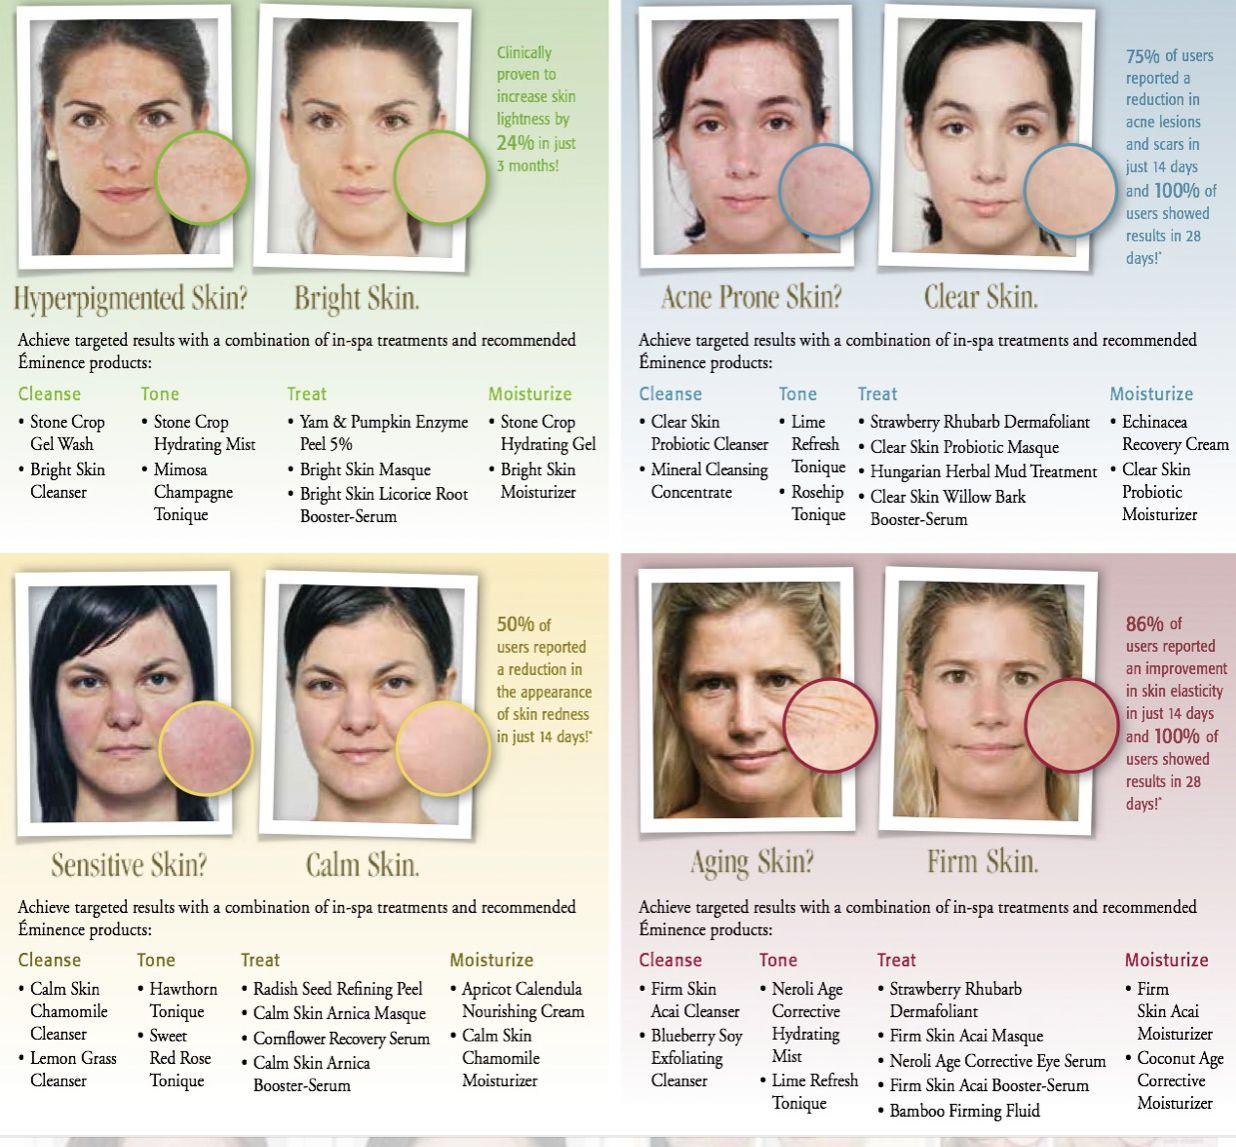 Eminence Organic Acne Skin Organic Acne Products Eminence Organic Skin Care